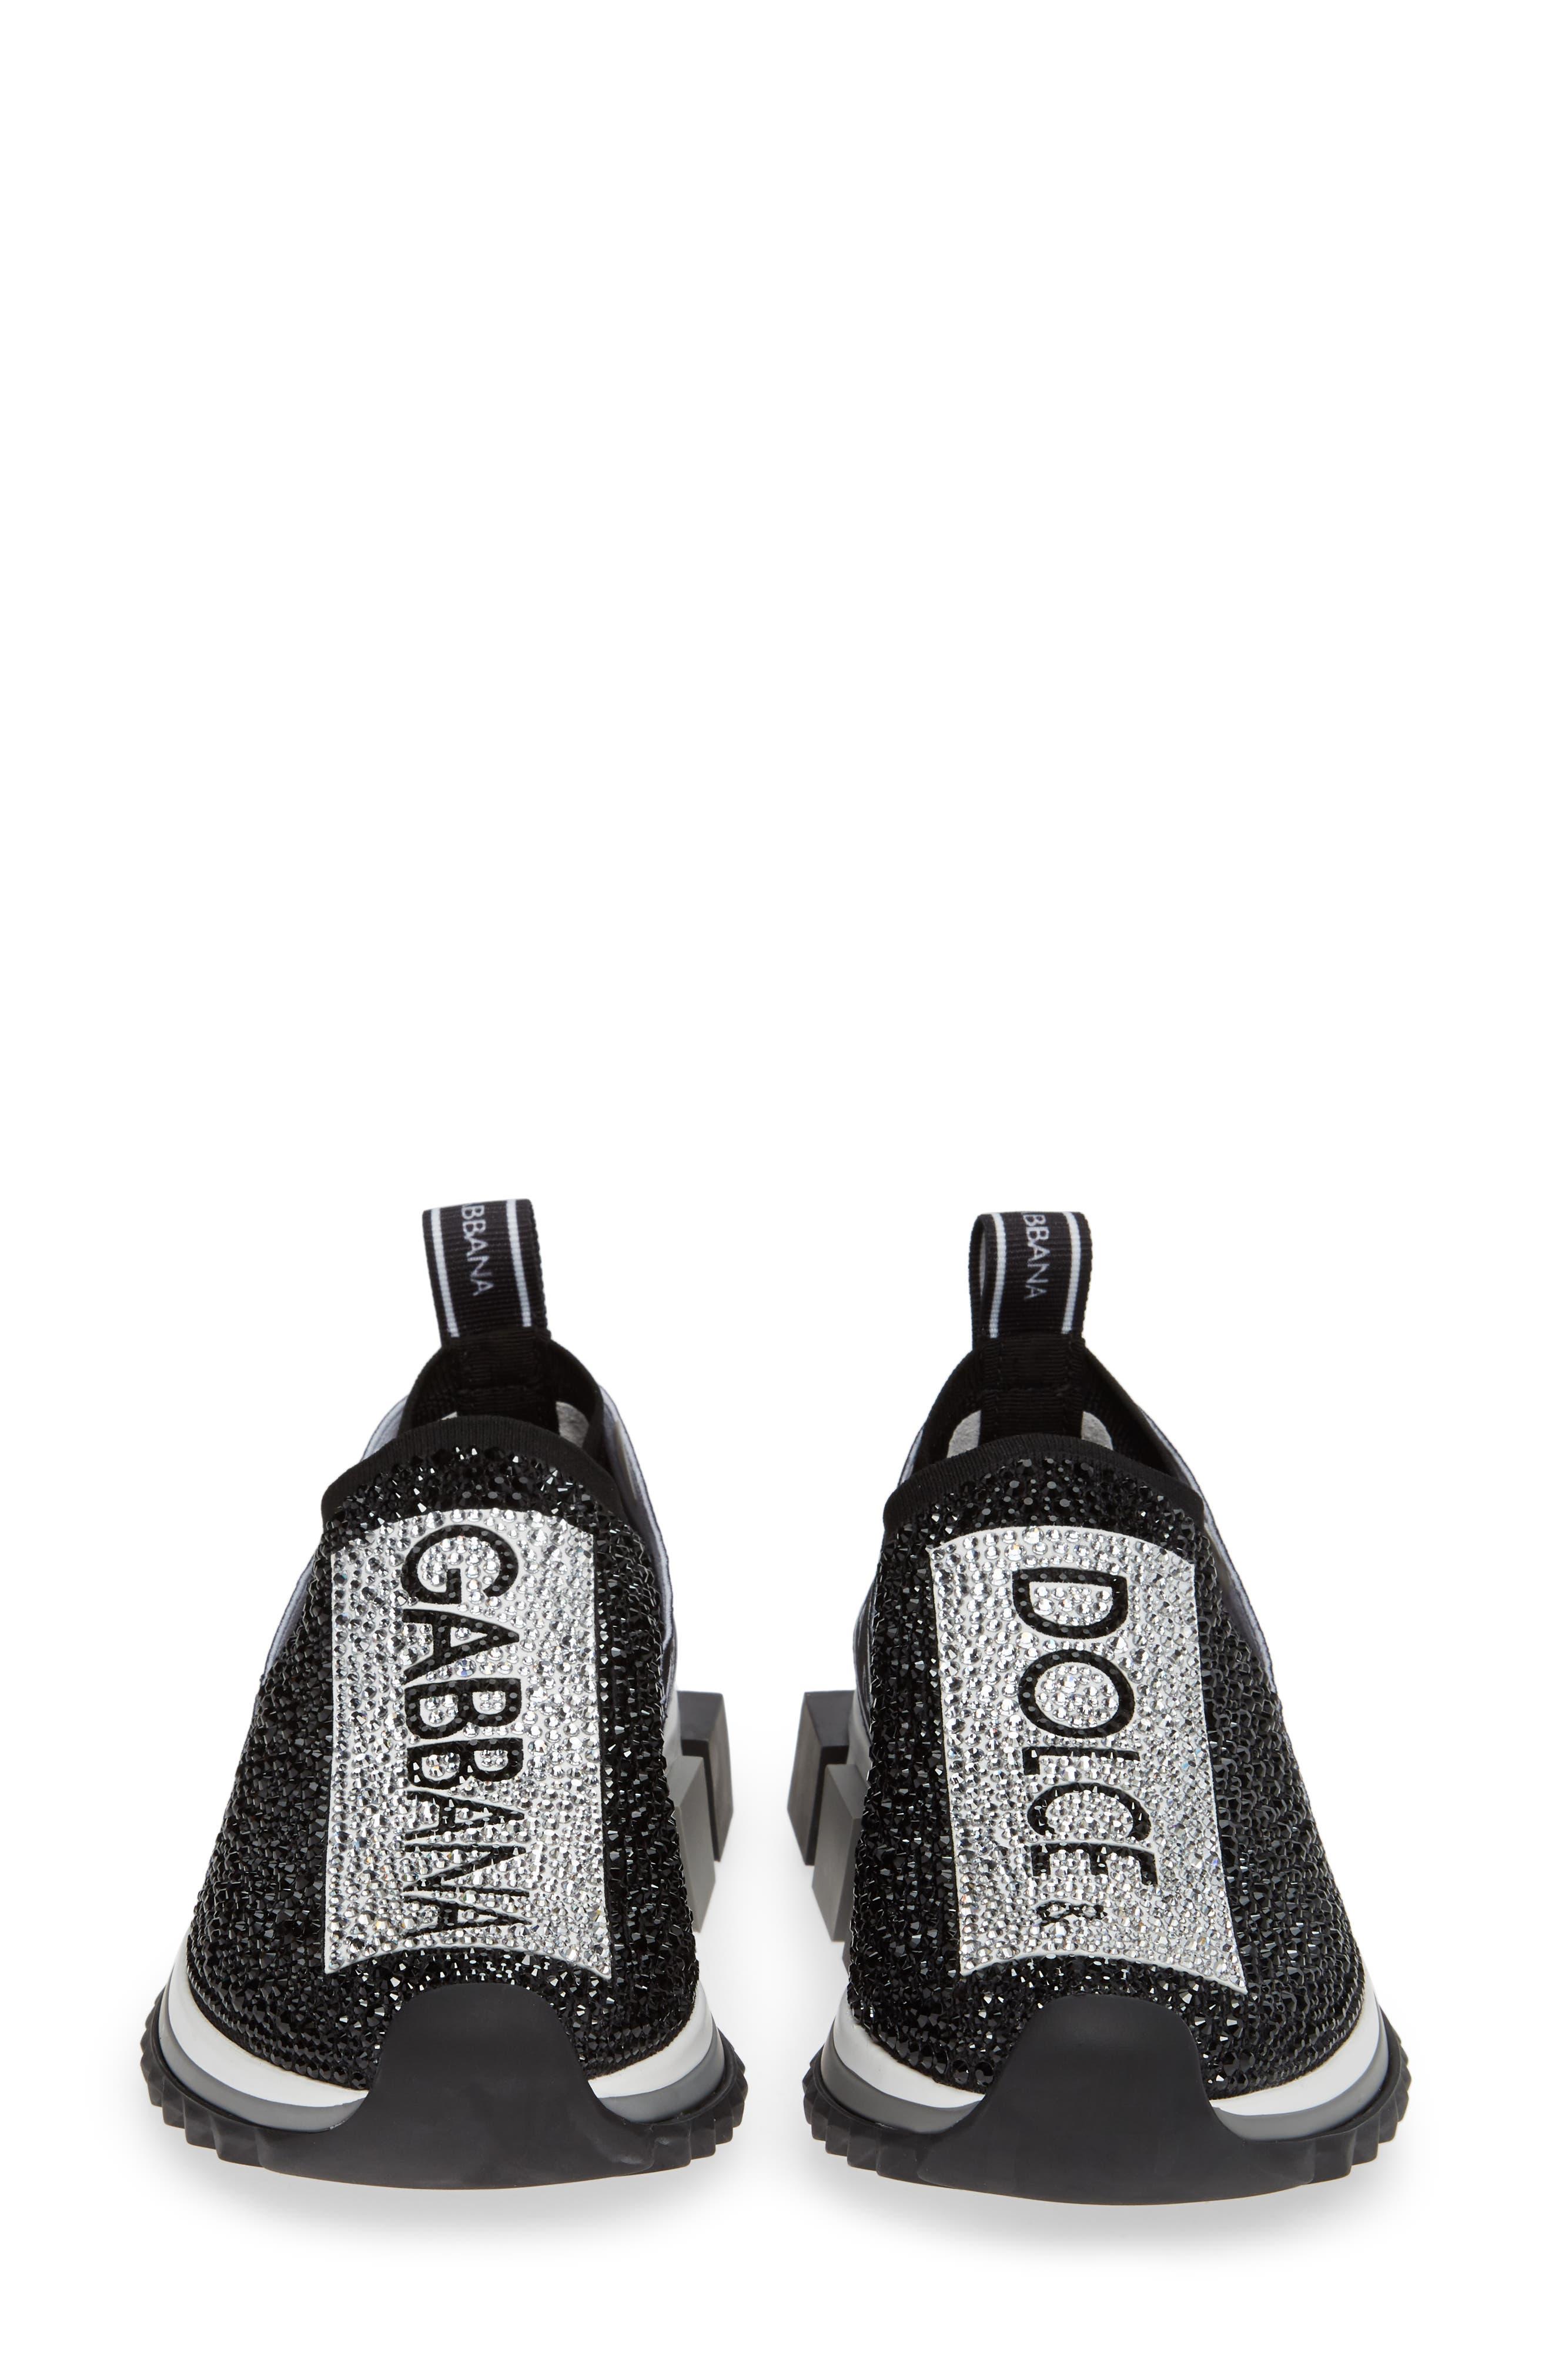 DOLCE&GABBANA, Sorrento Jeweled Logo Sneaker, Alternate thumbnail 5, color, 040